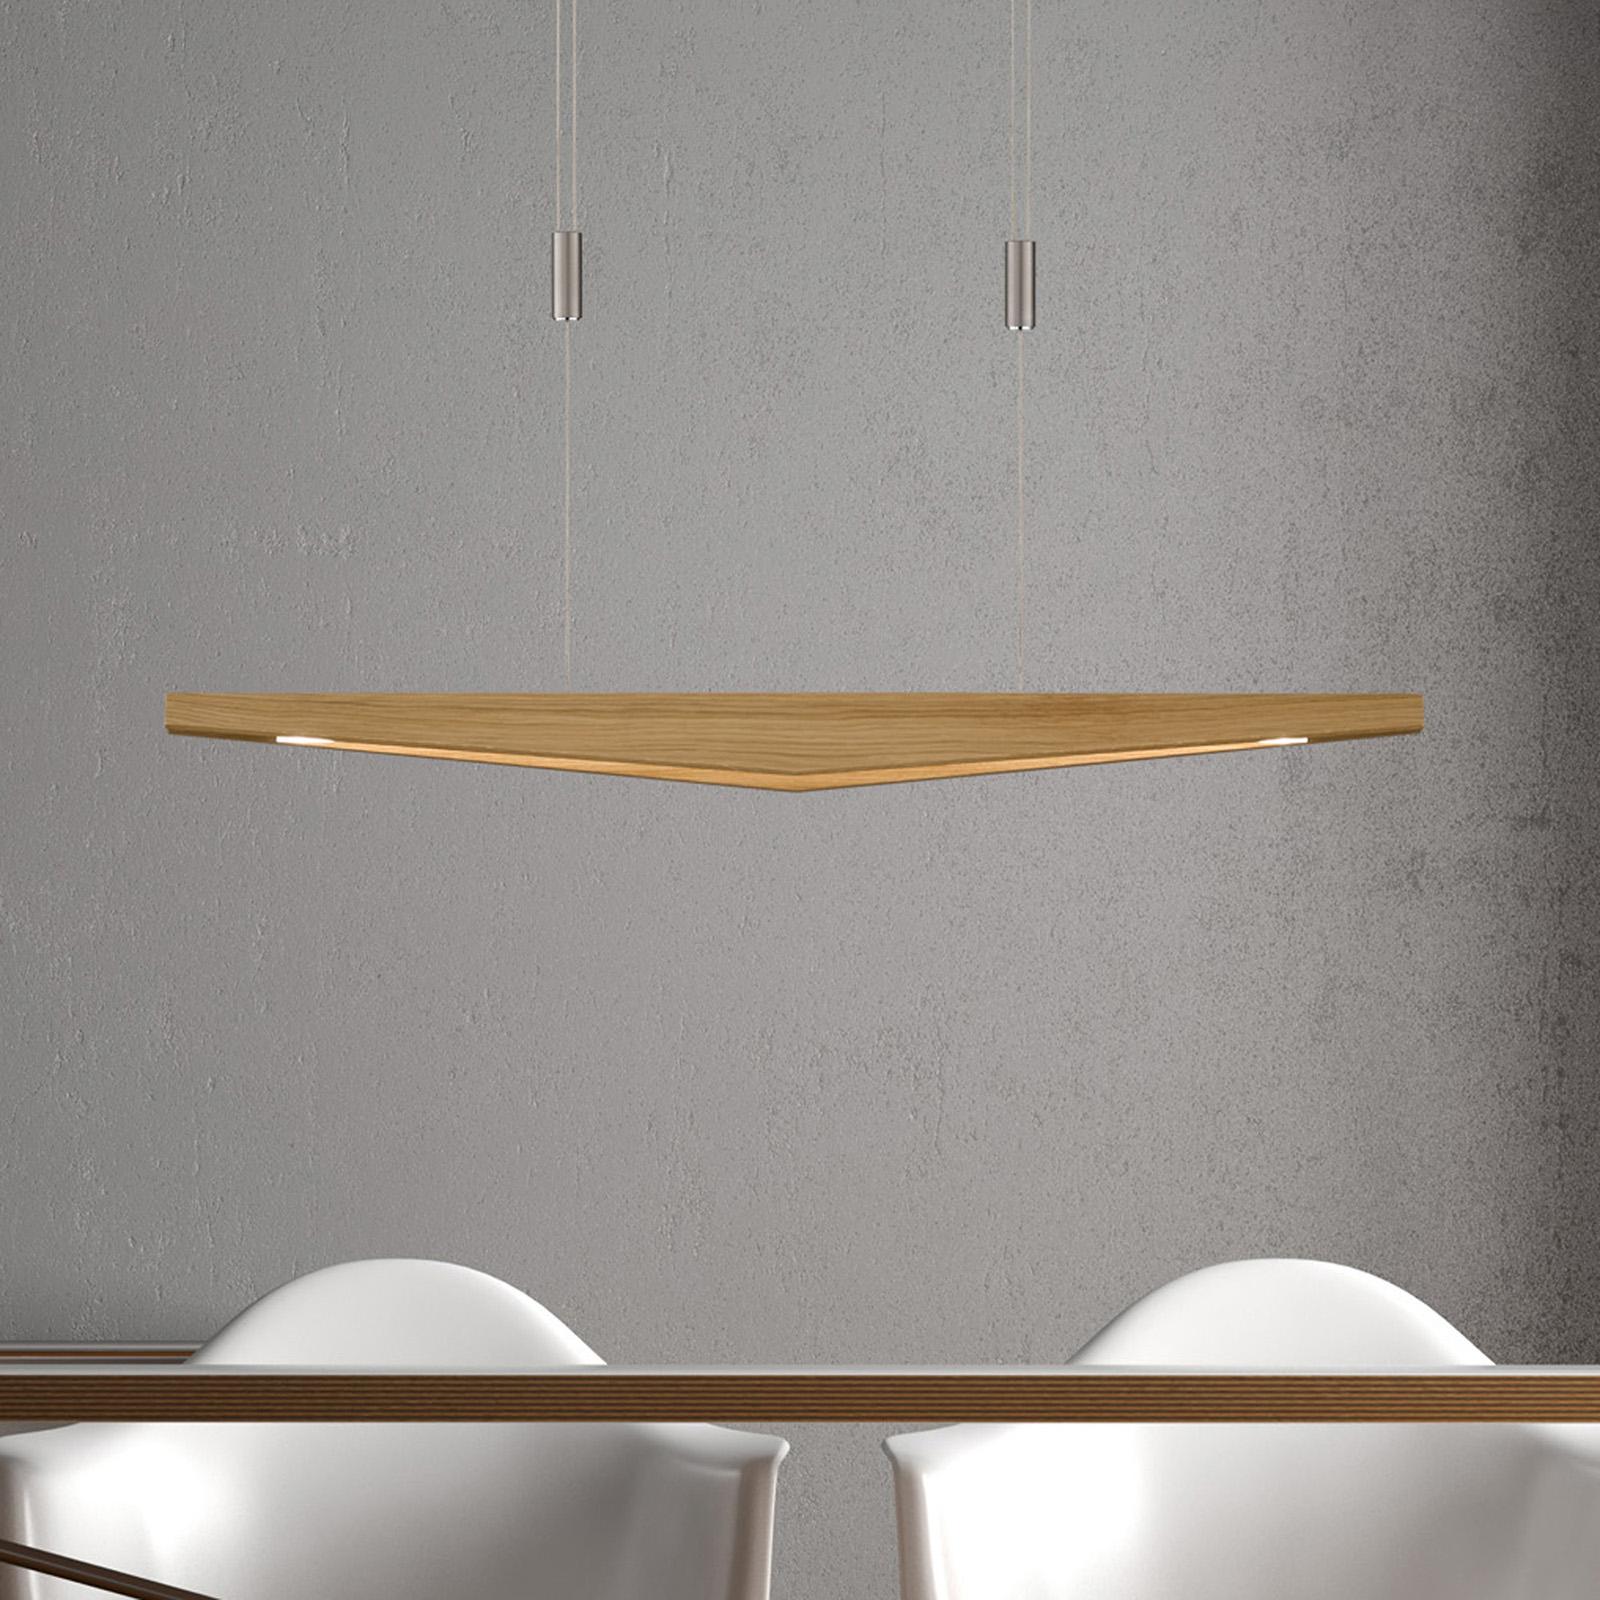 Lucande Dila LED-pendellampa ek natur 88 cm